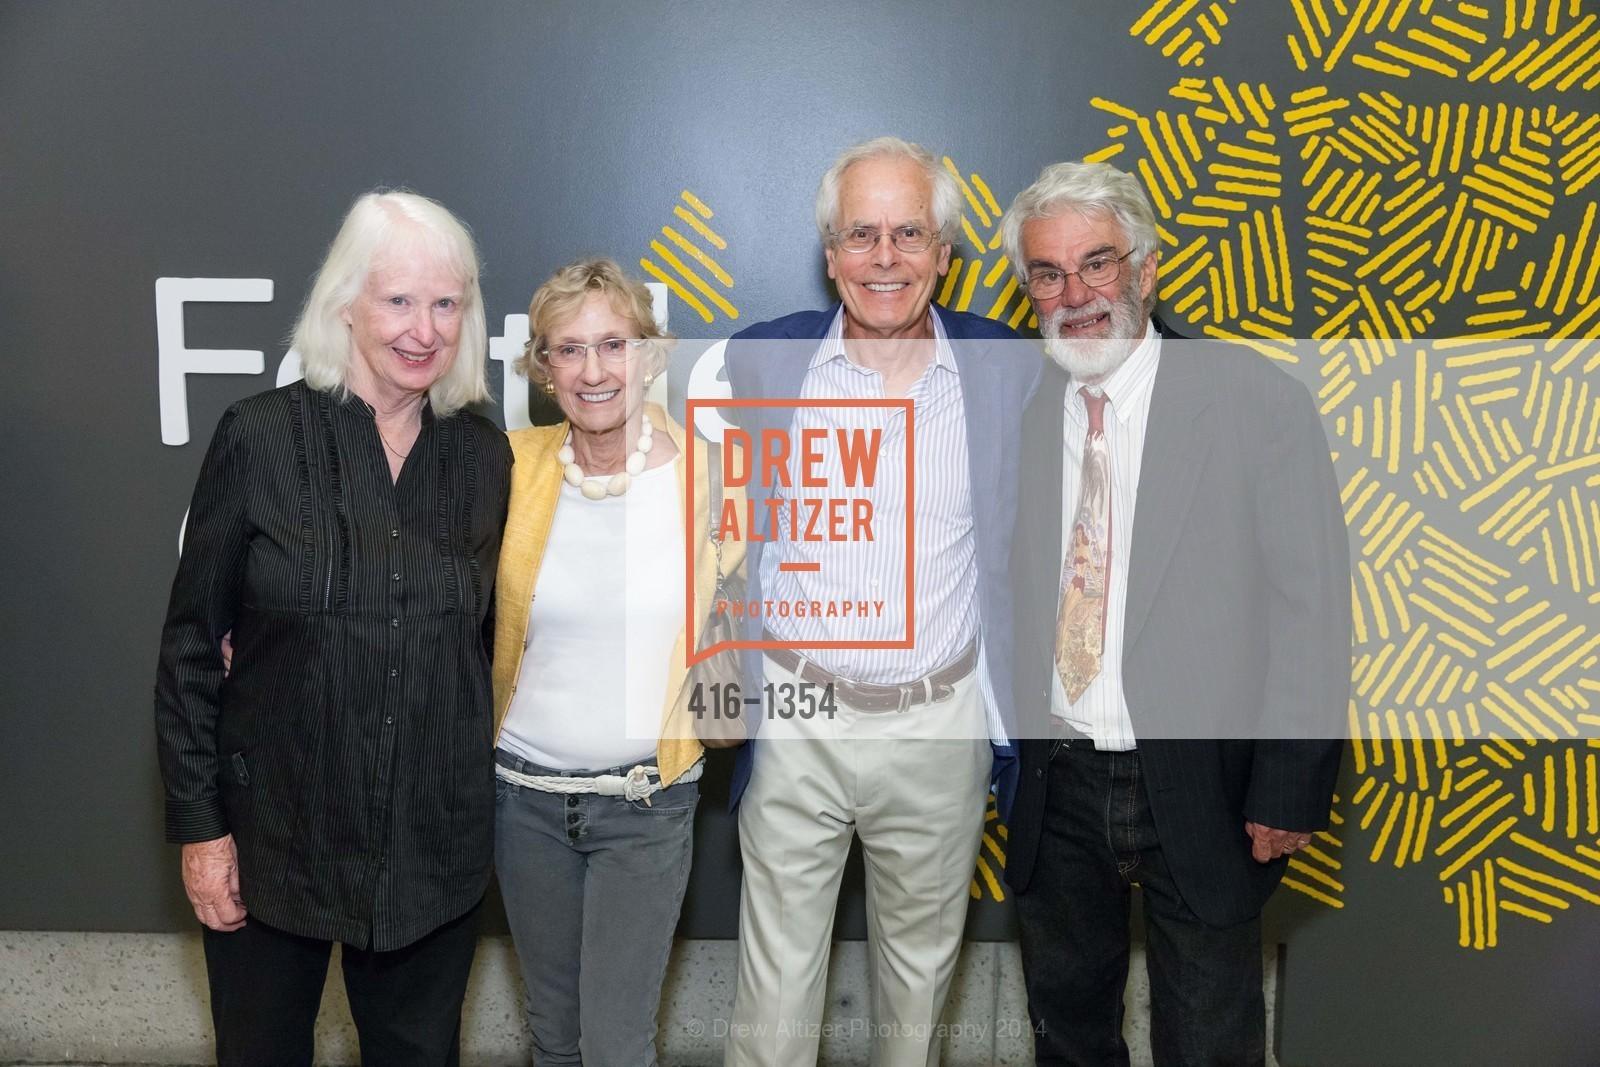 Martha Shaw, Nancy Bechtle, Joachim Bechtle, Richard Shaw, Photo #416-1354